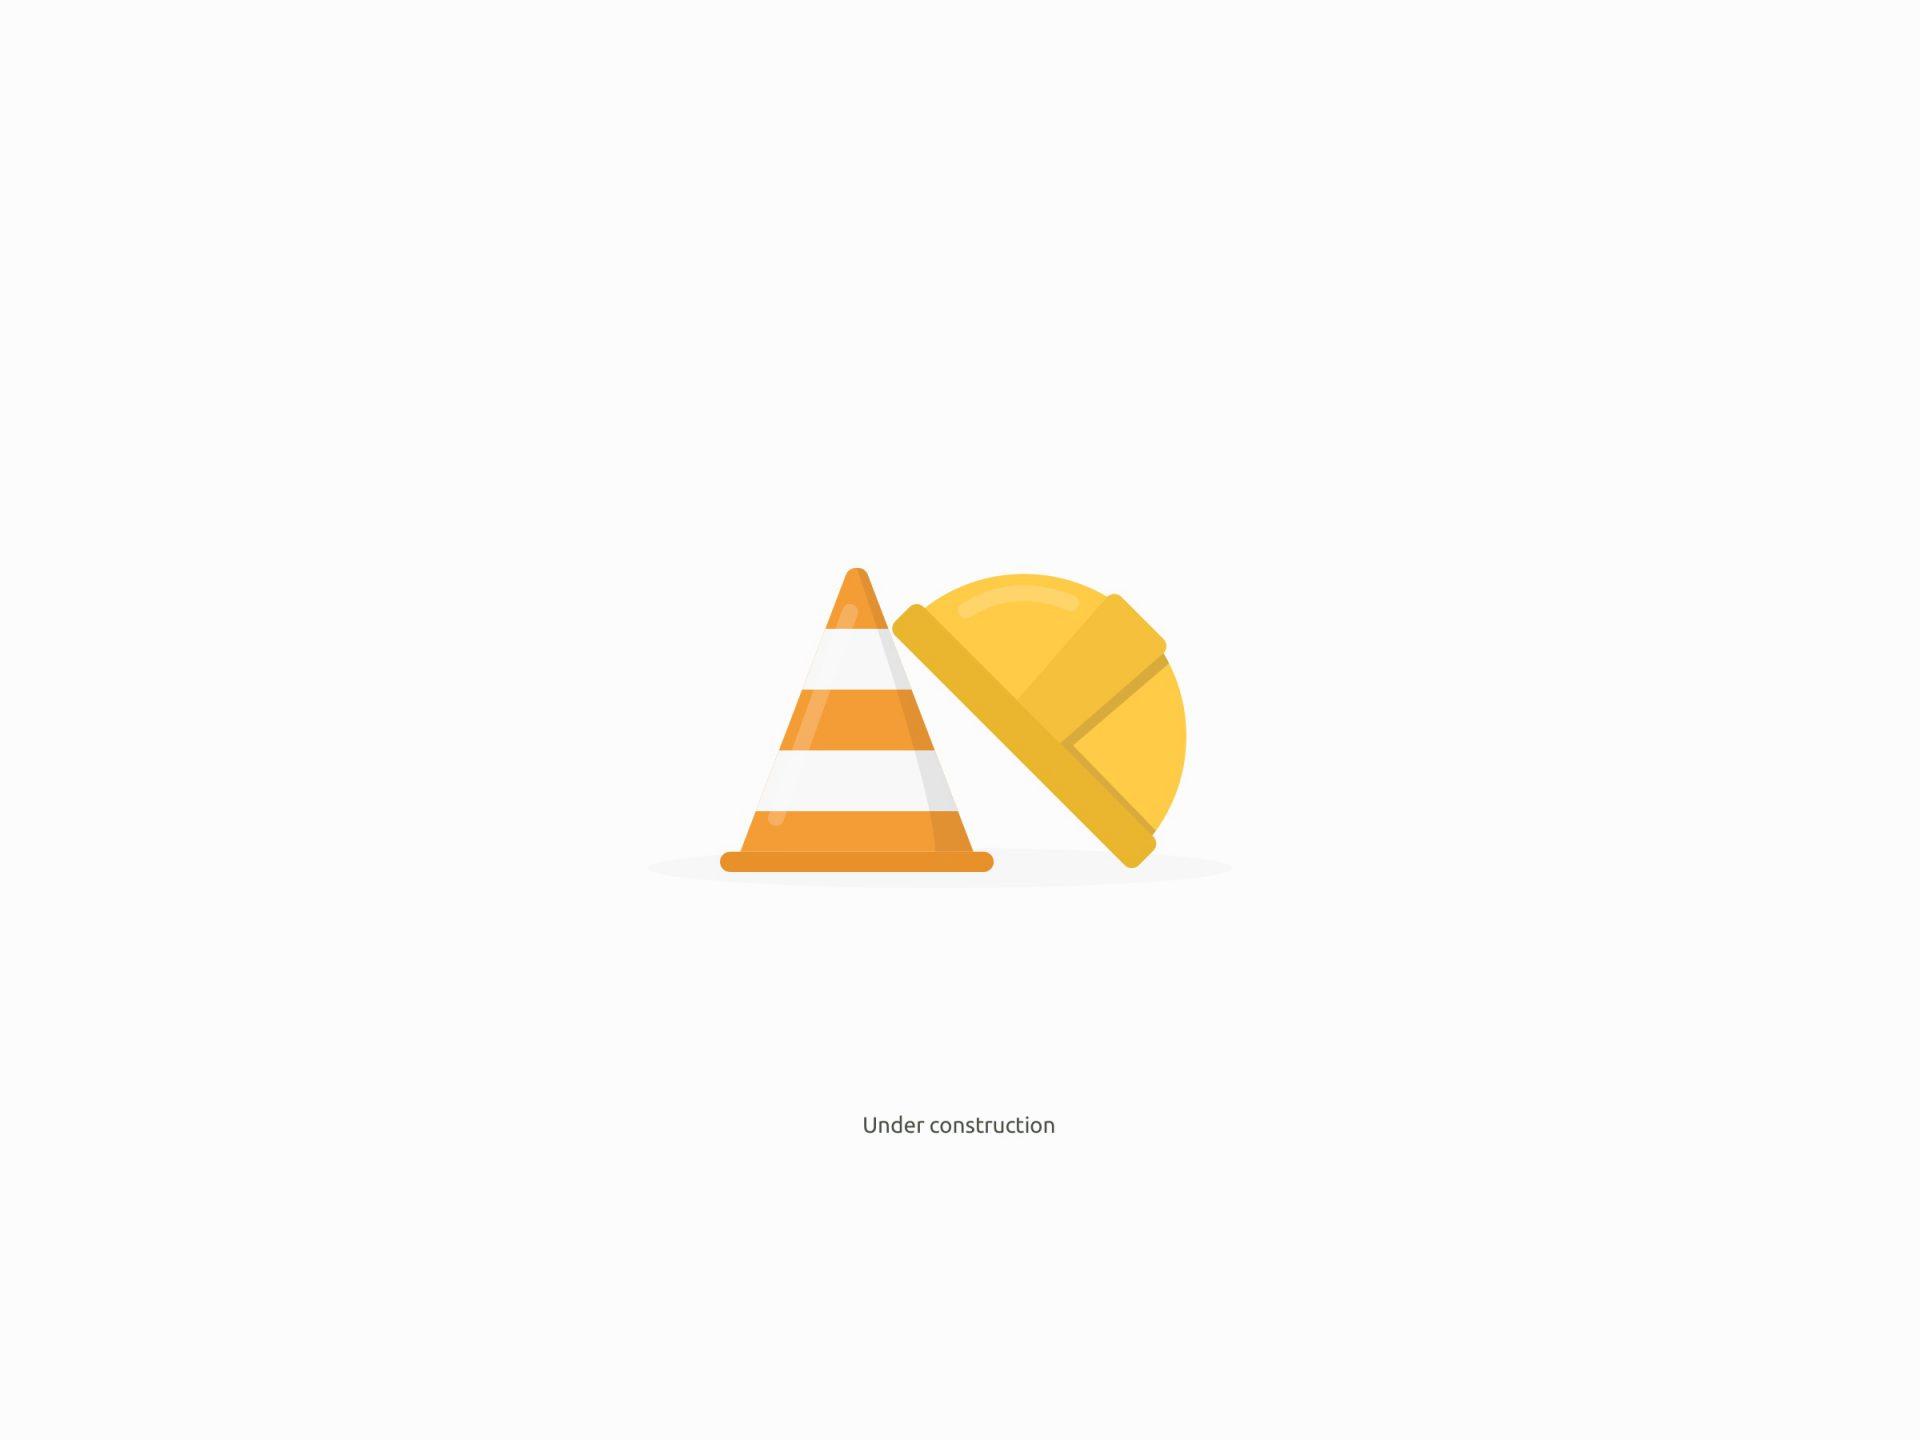 Under Construction Icon Design